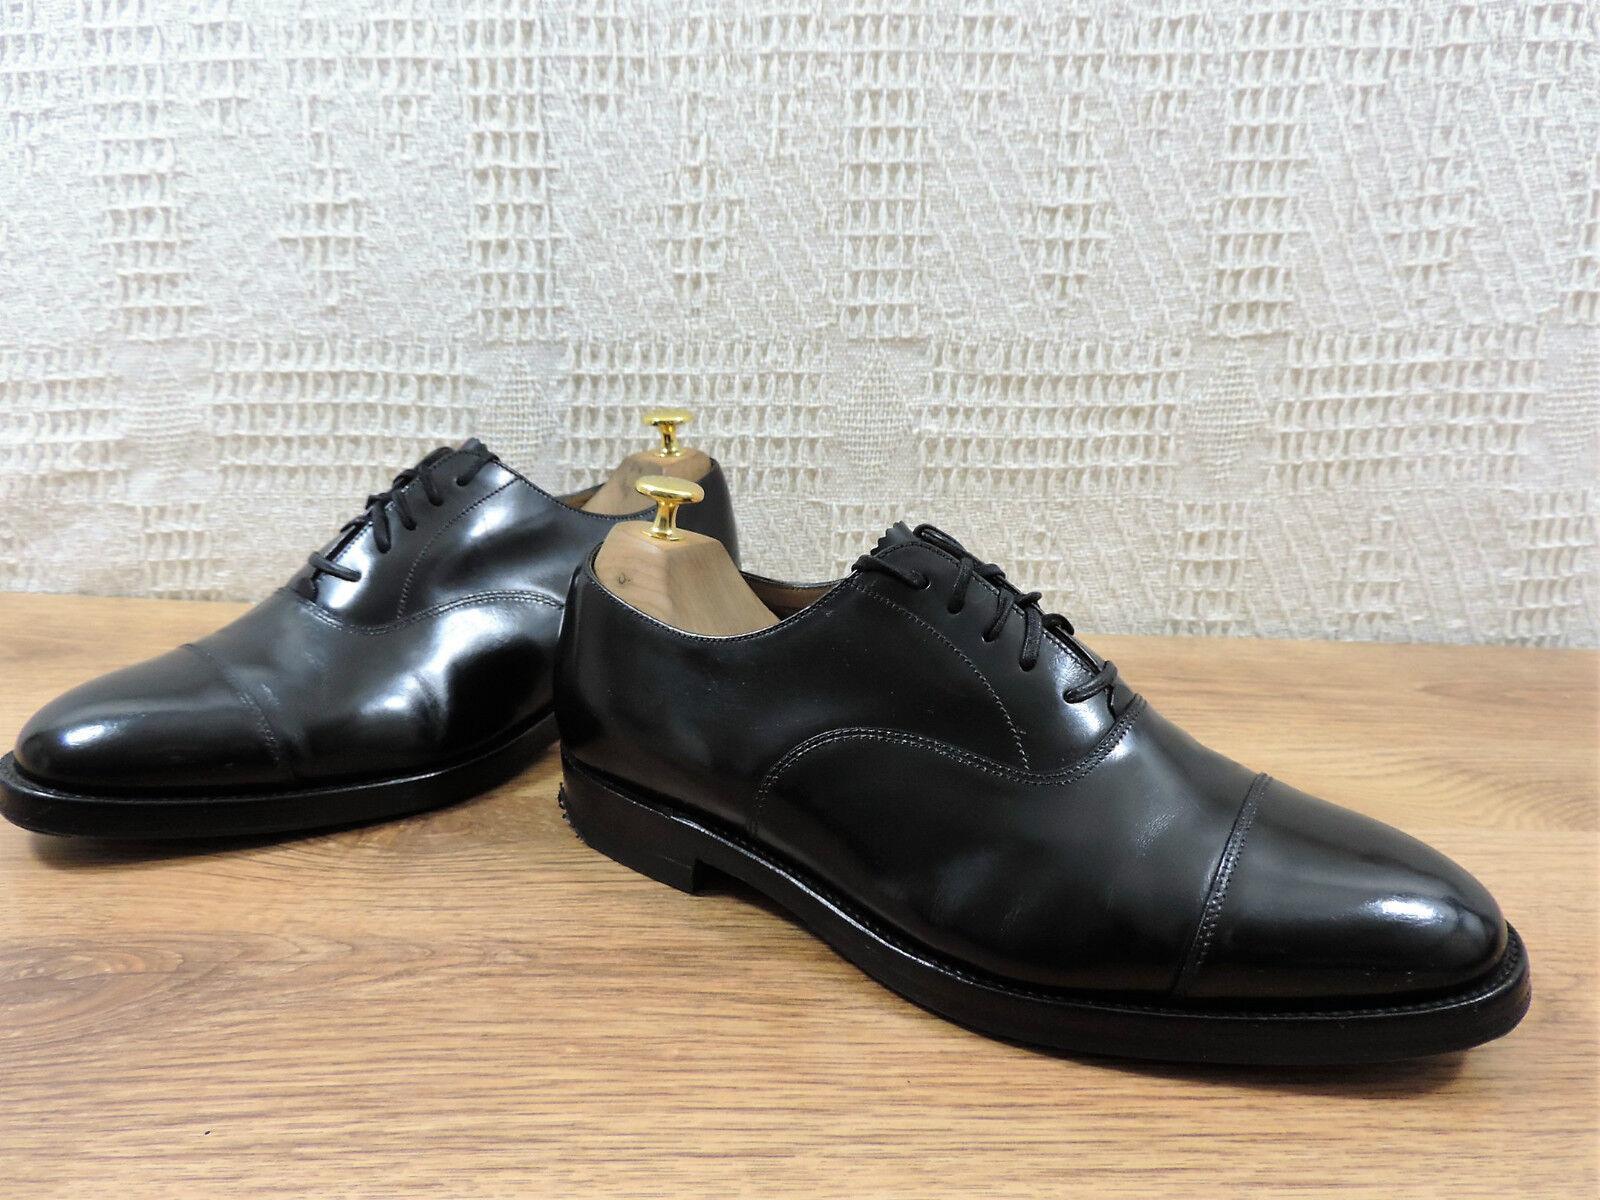 Loake Herren Schwarz Oxford Kappe Rahmengenähte Leder Leder Rahmengenähte Schuhe UK 8.5 G Us 9.5 Eu a827b9